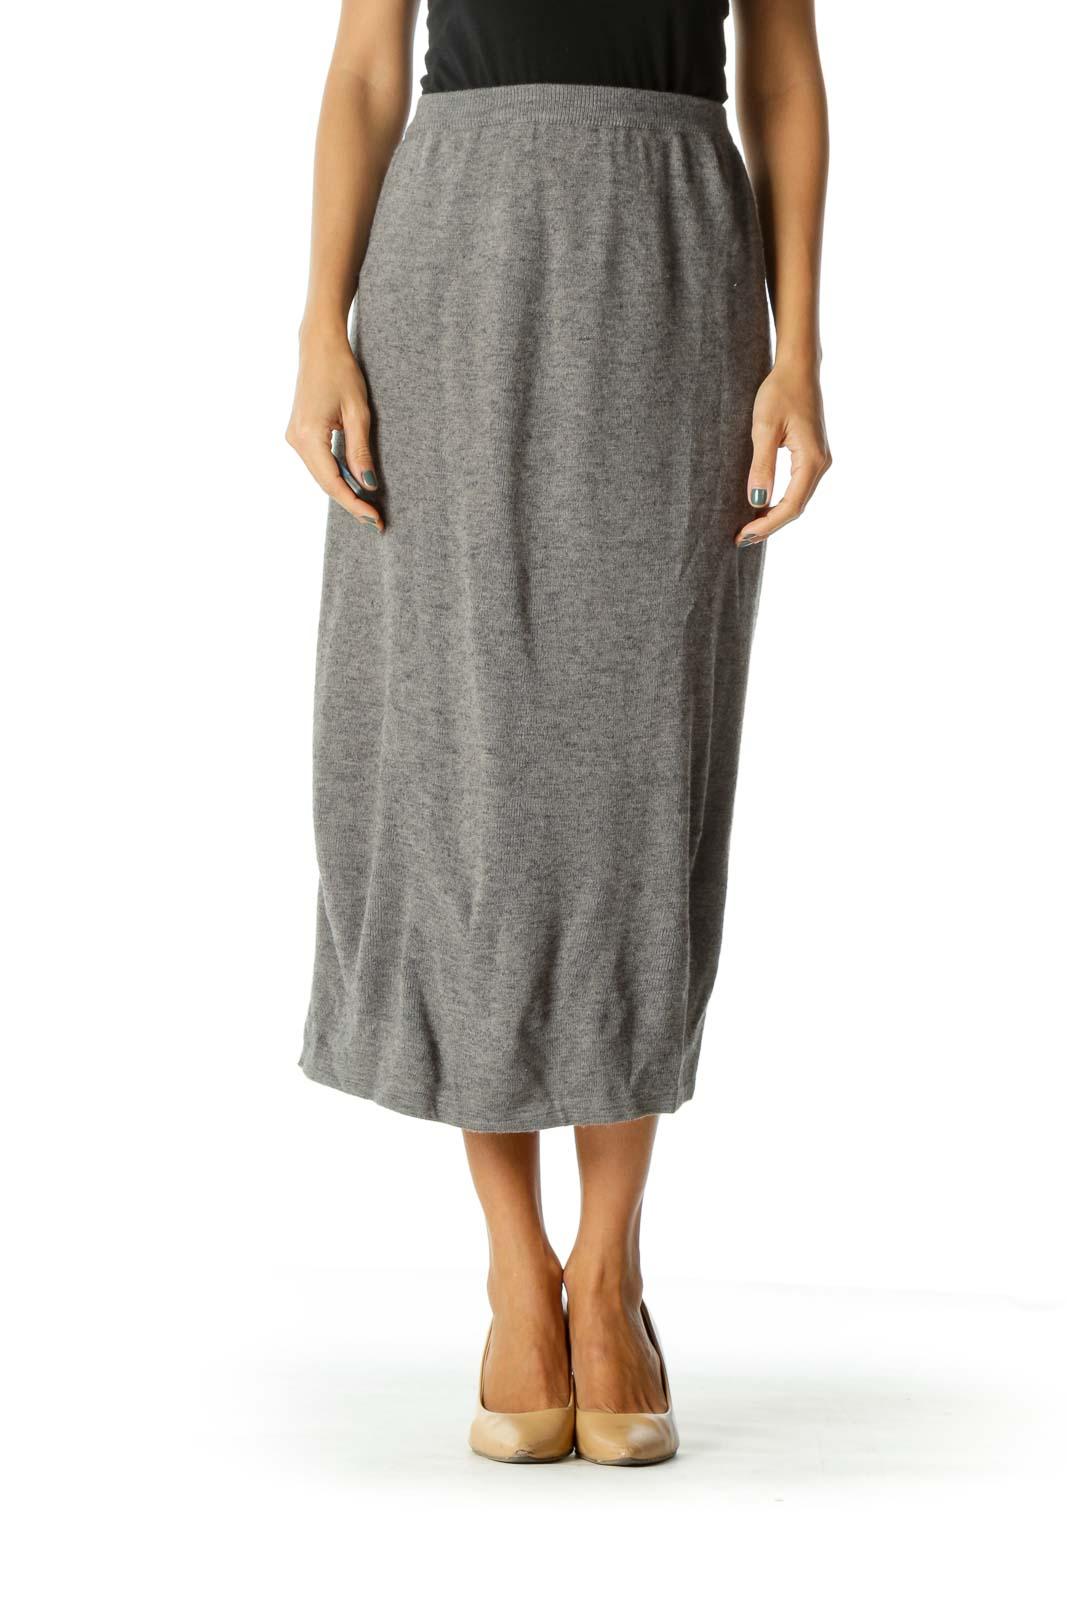 Gray Knit Elastic Band Midi Skirt